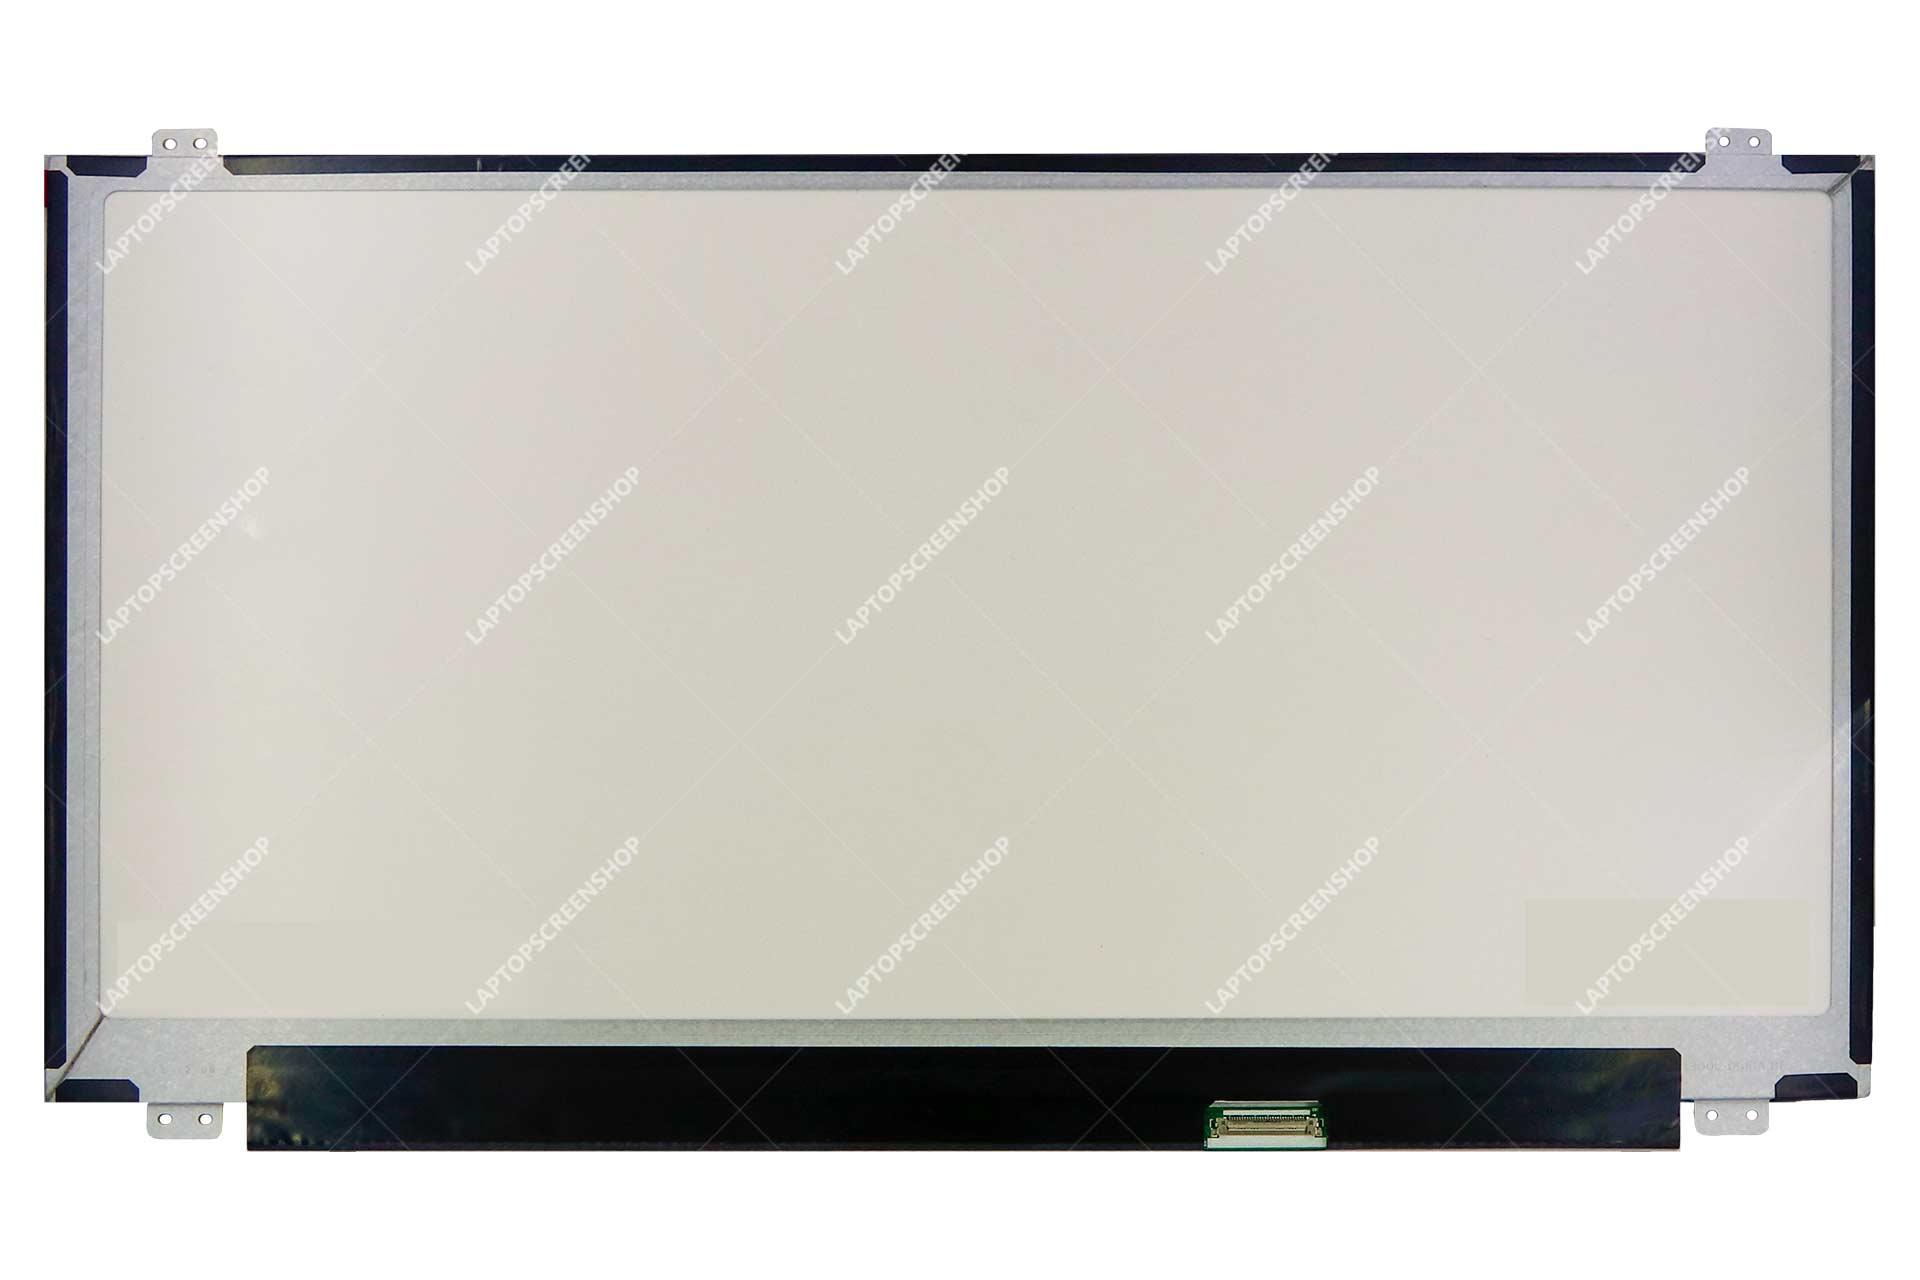 ACER-ASPIRE-E1-472-6674-LCD |HD|فروشگاه لپ تاپ اسکرين | تعمير لپ تاپ